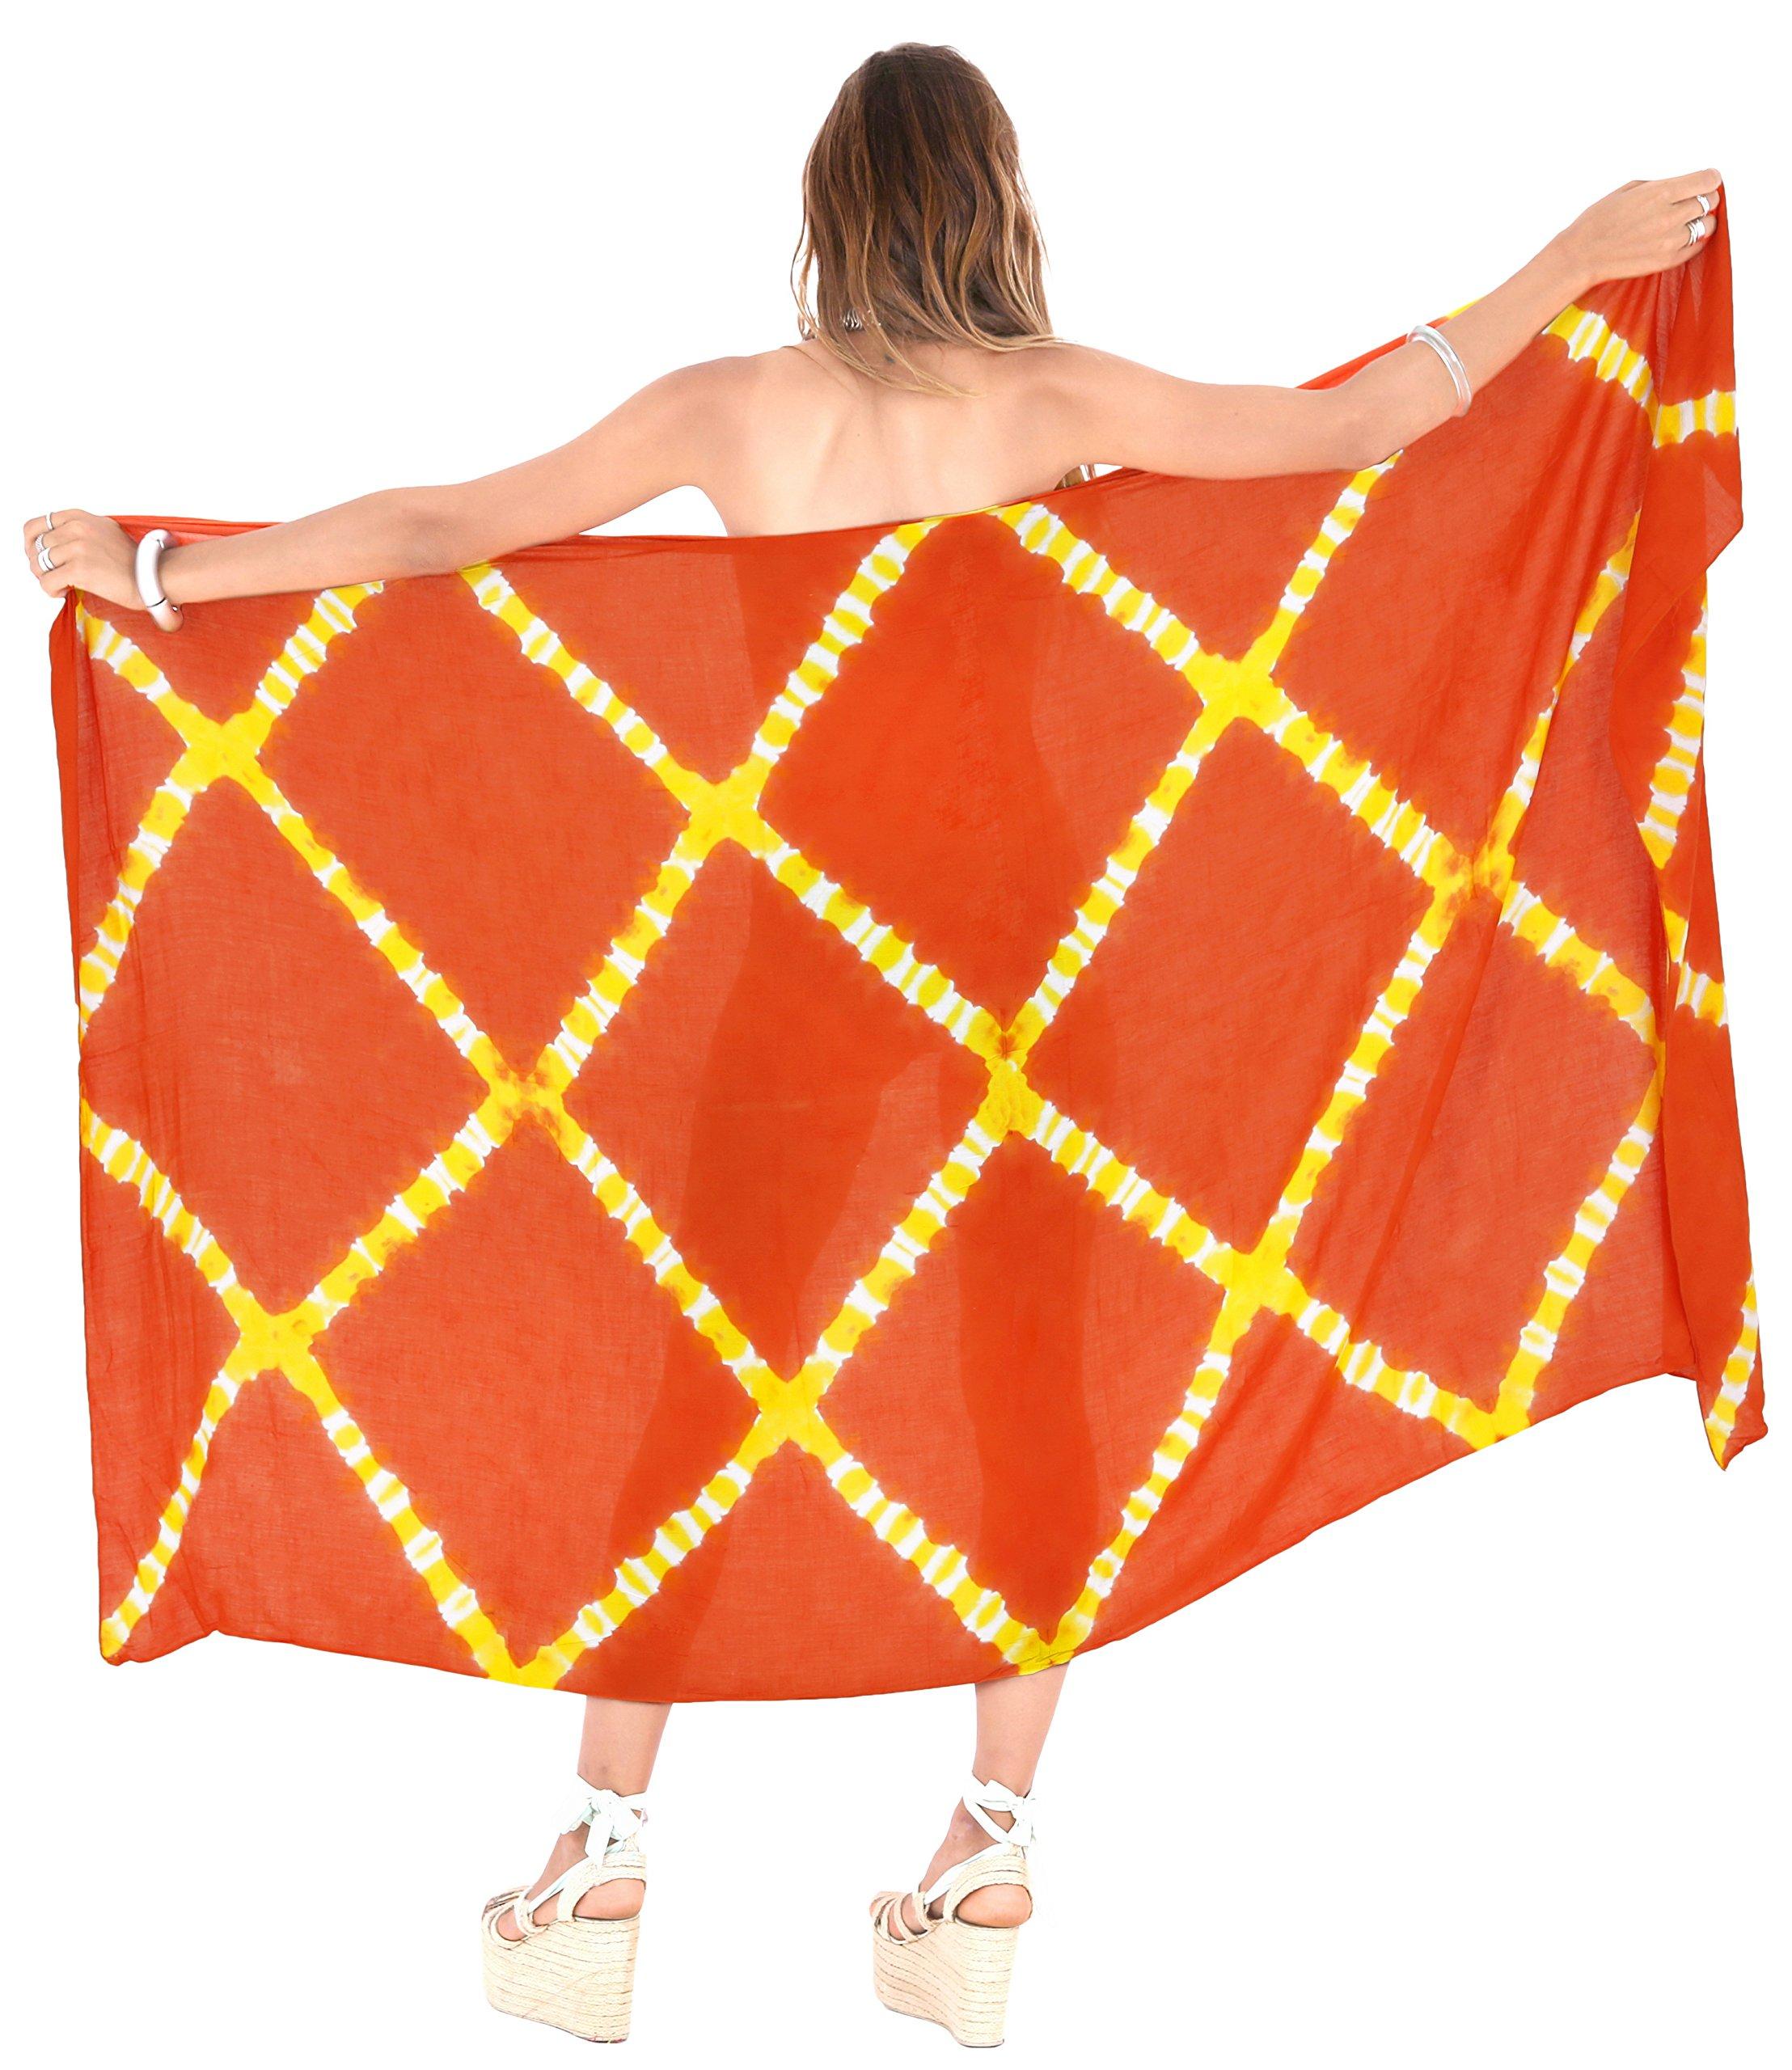 LA LEELA Rayon Costumi da Bagno Involucro Pareo Avvolgere Lungo Sarong Tie Dye 2 spesavip